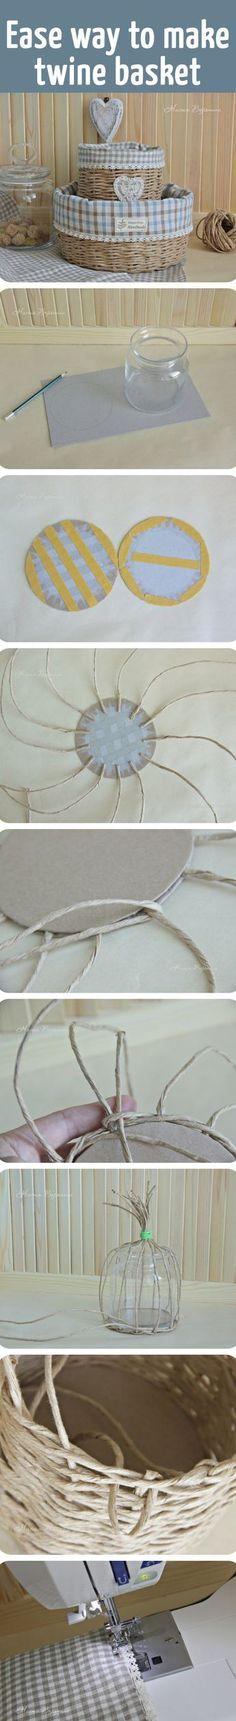 "Плетем корзинку ""Прованс"": мастерим из бумажного шпагата милый аксессуар для уютного дома / Easy way to make twine basket"